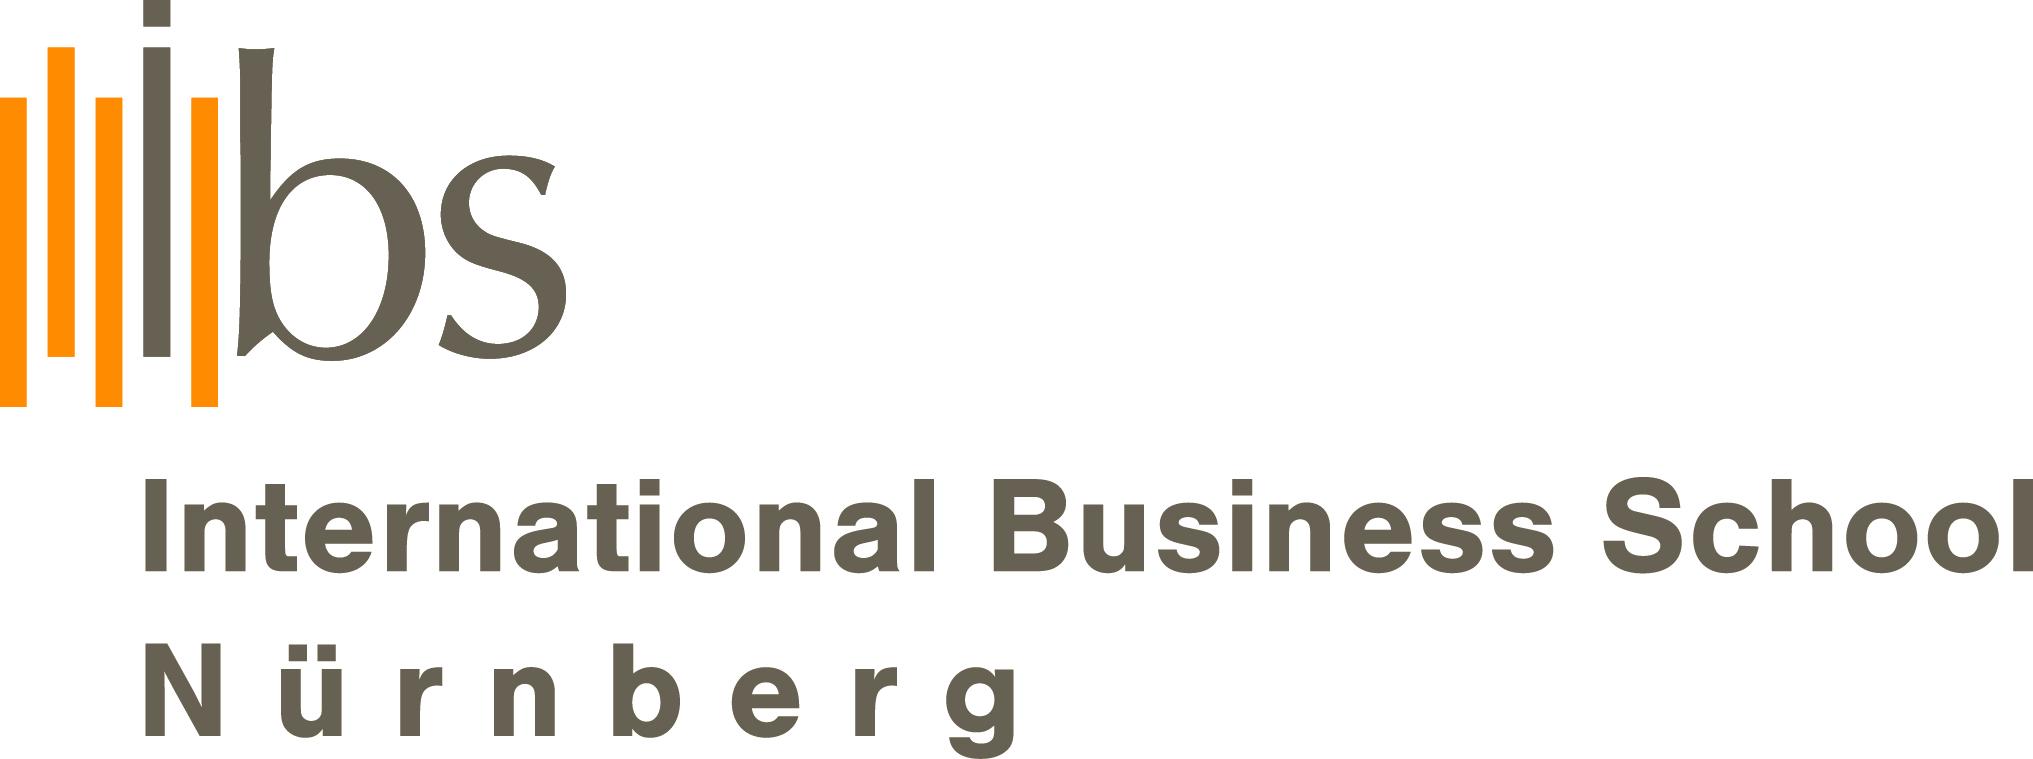 International Business School Nürnberg